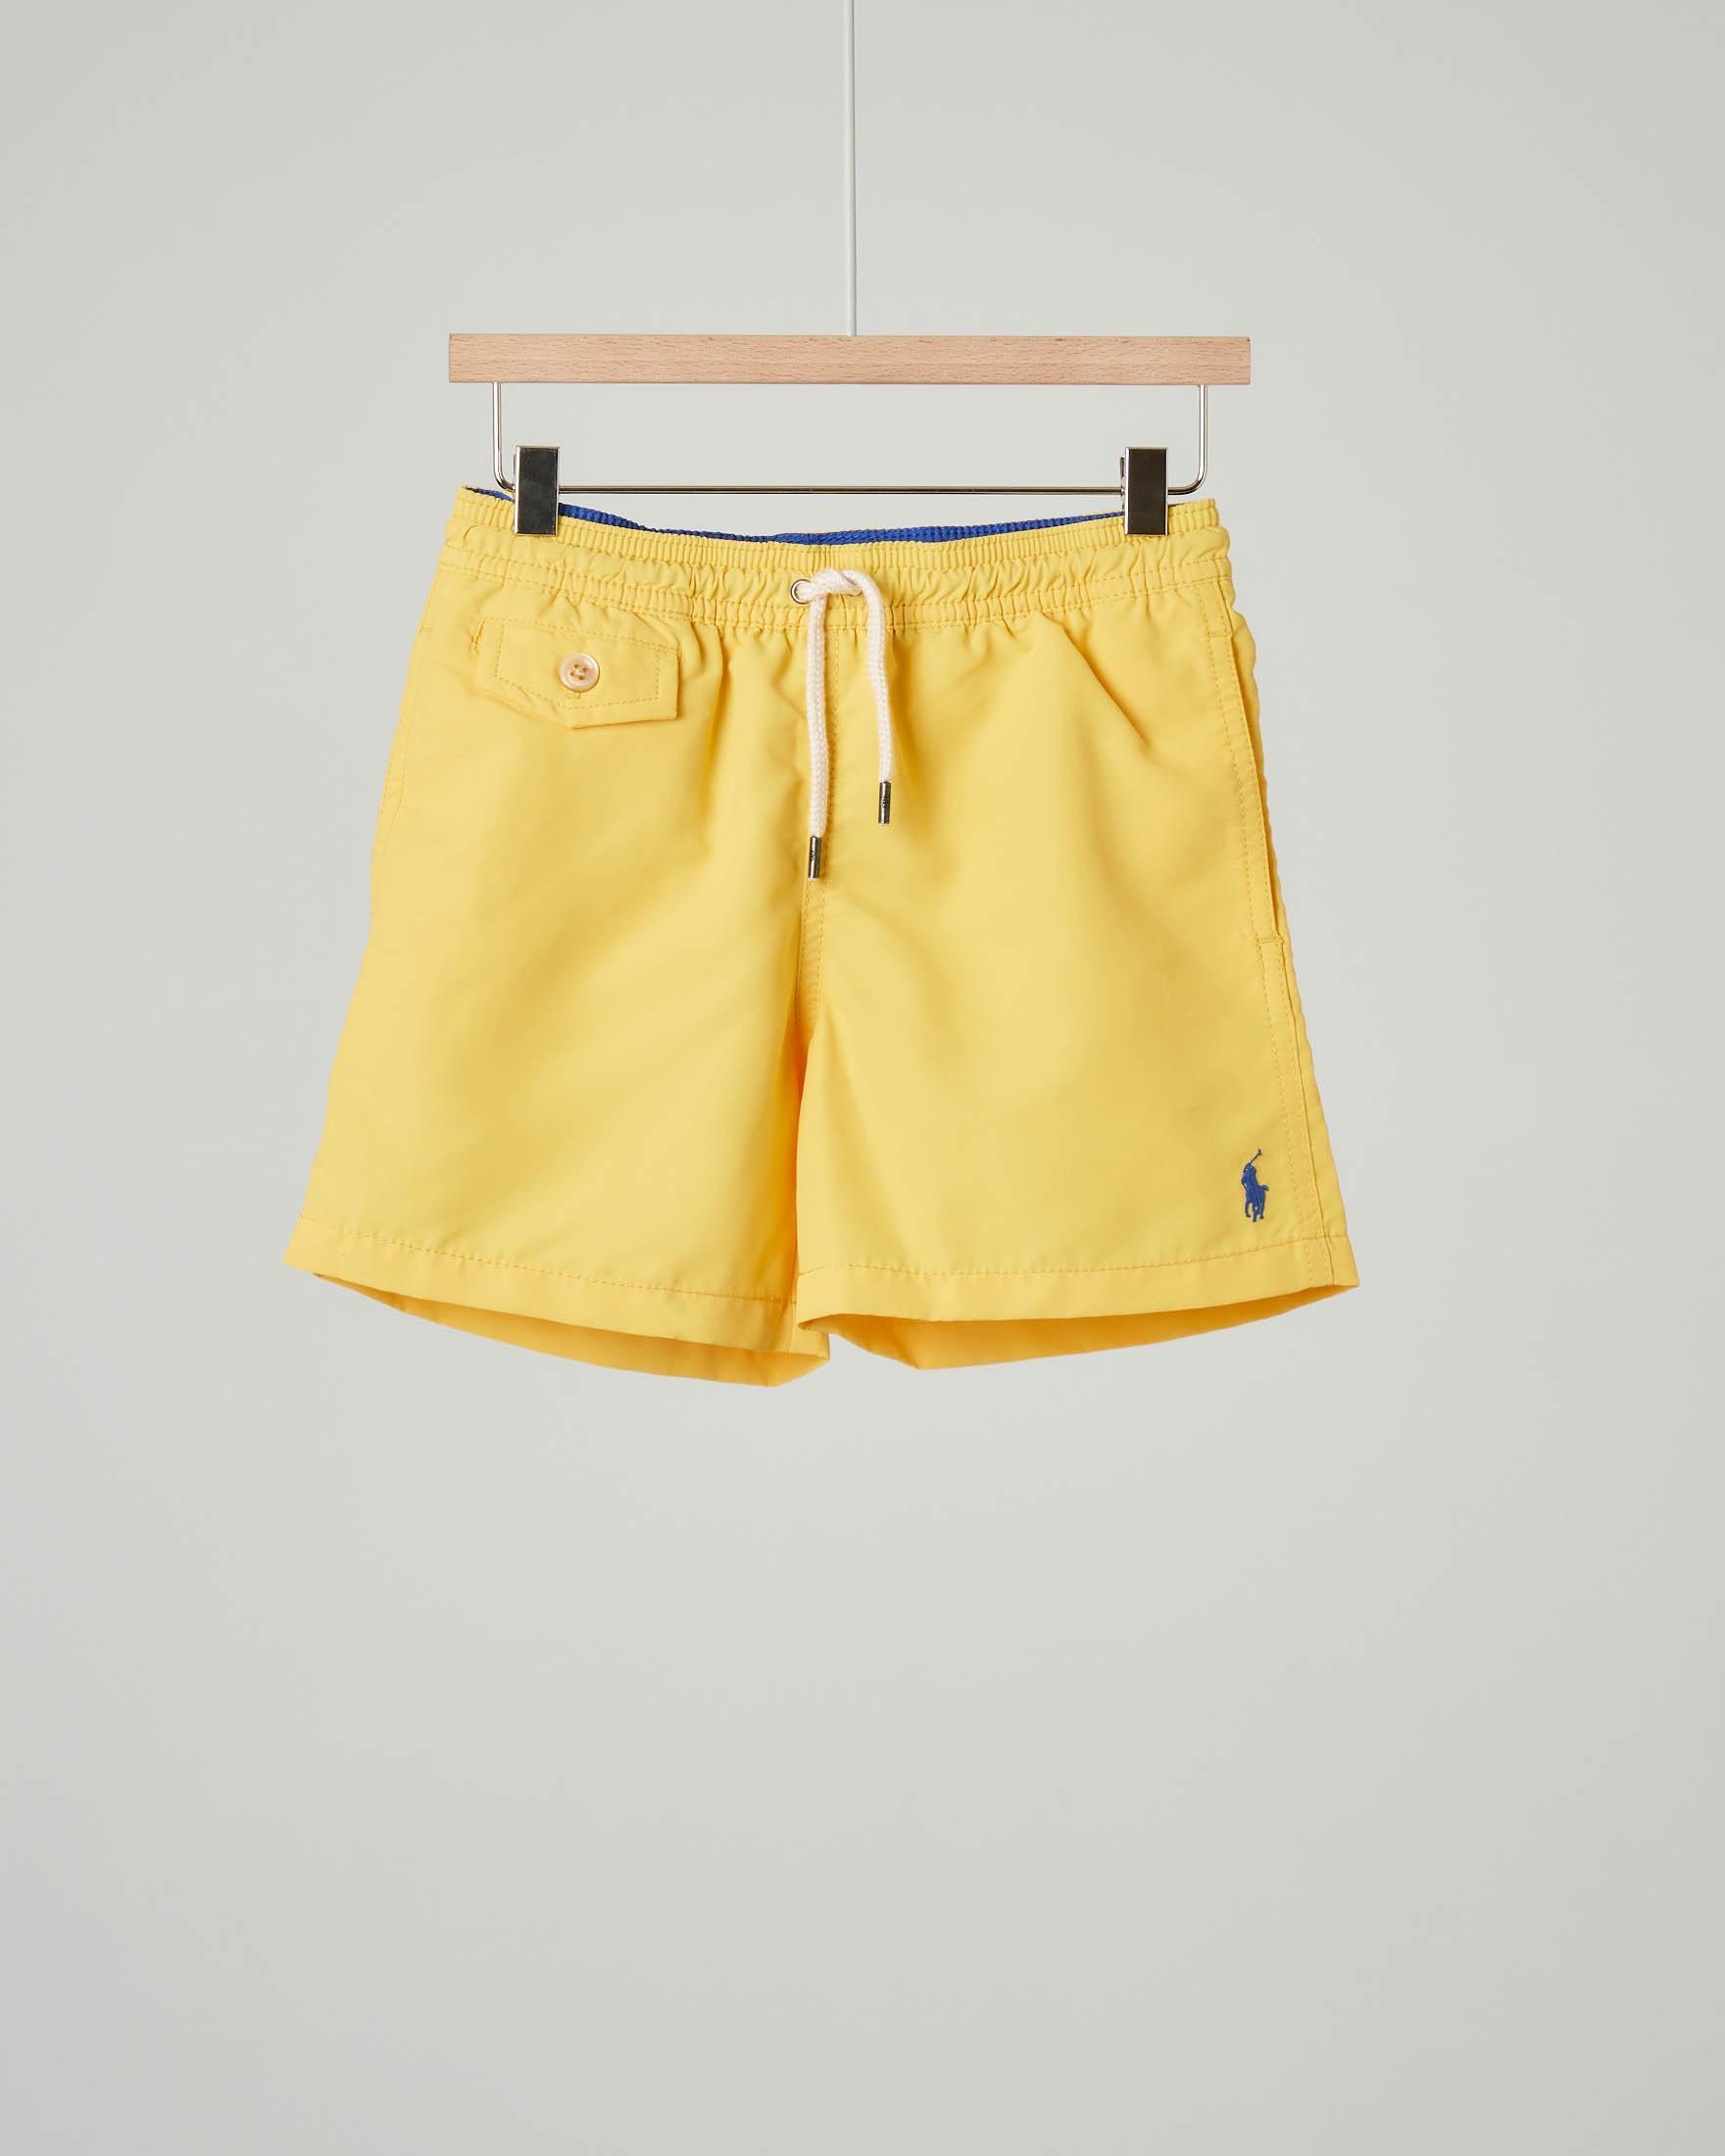 Costume boxer giallo